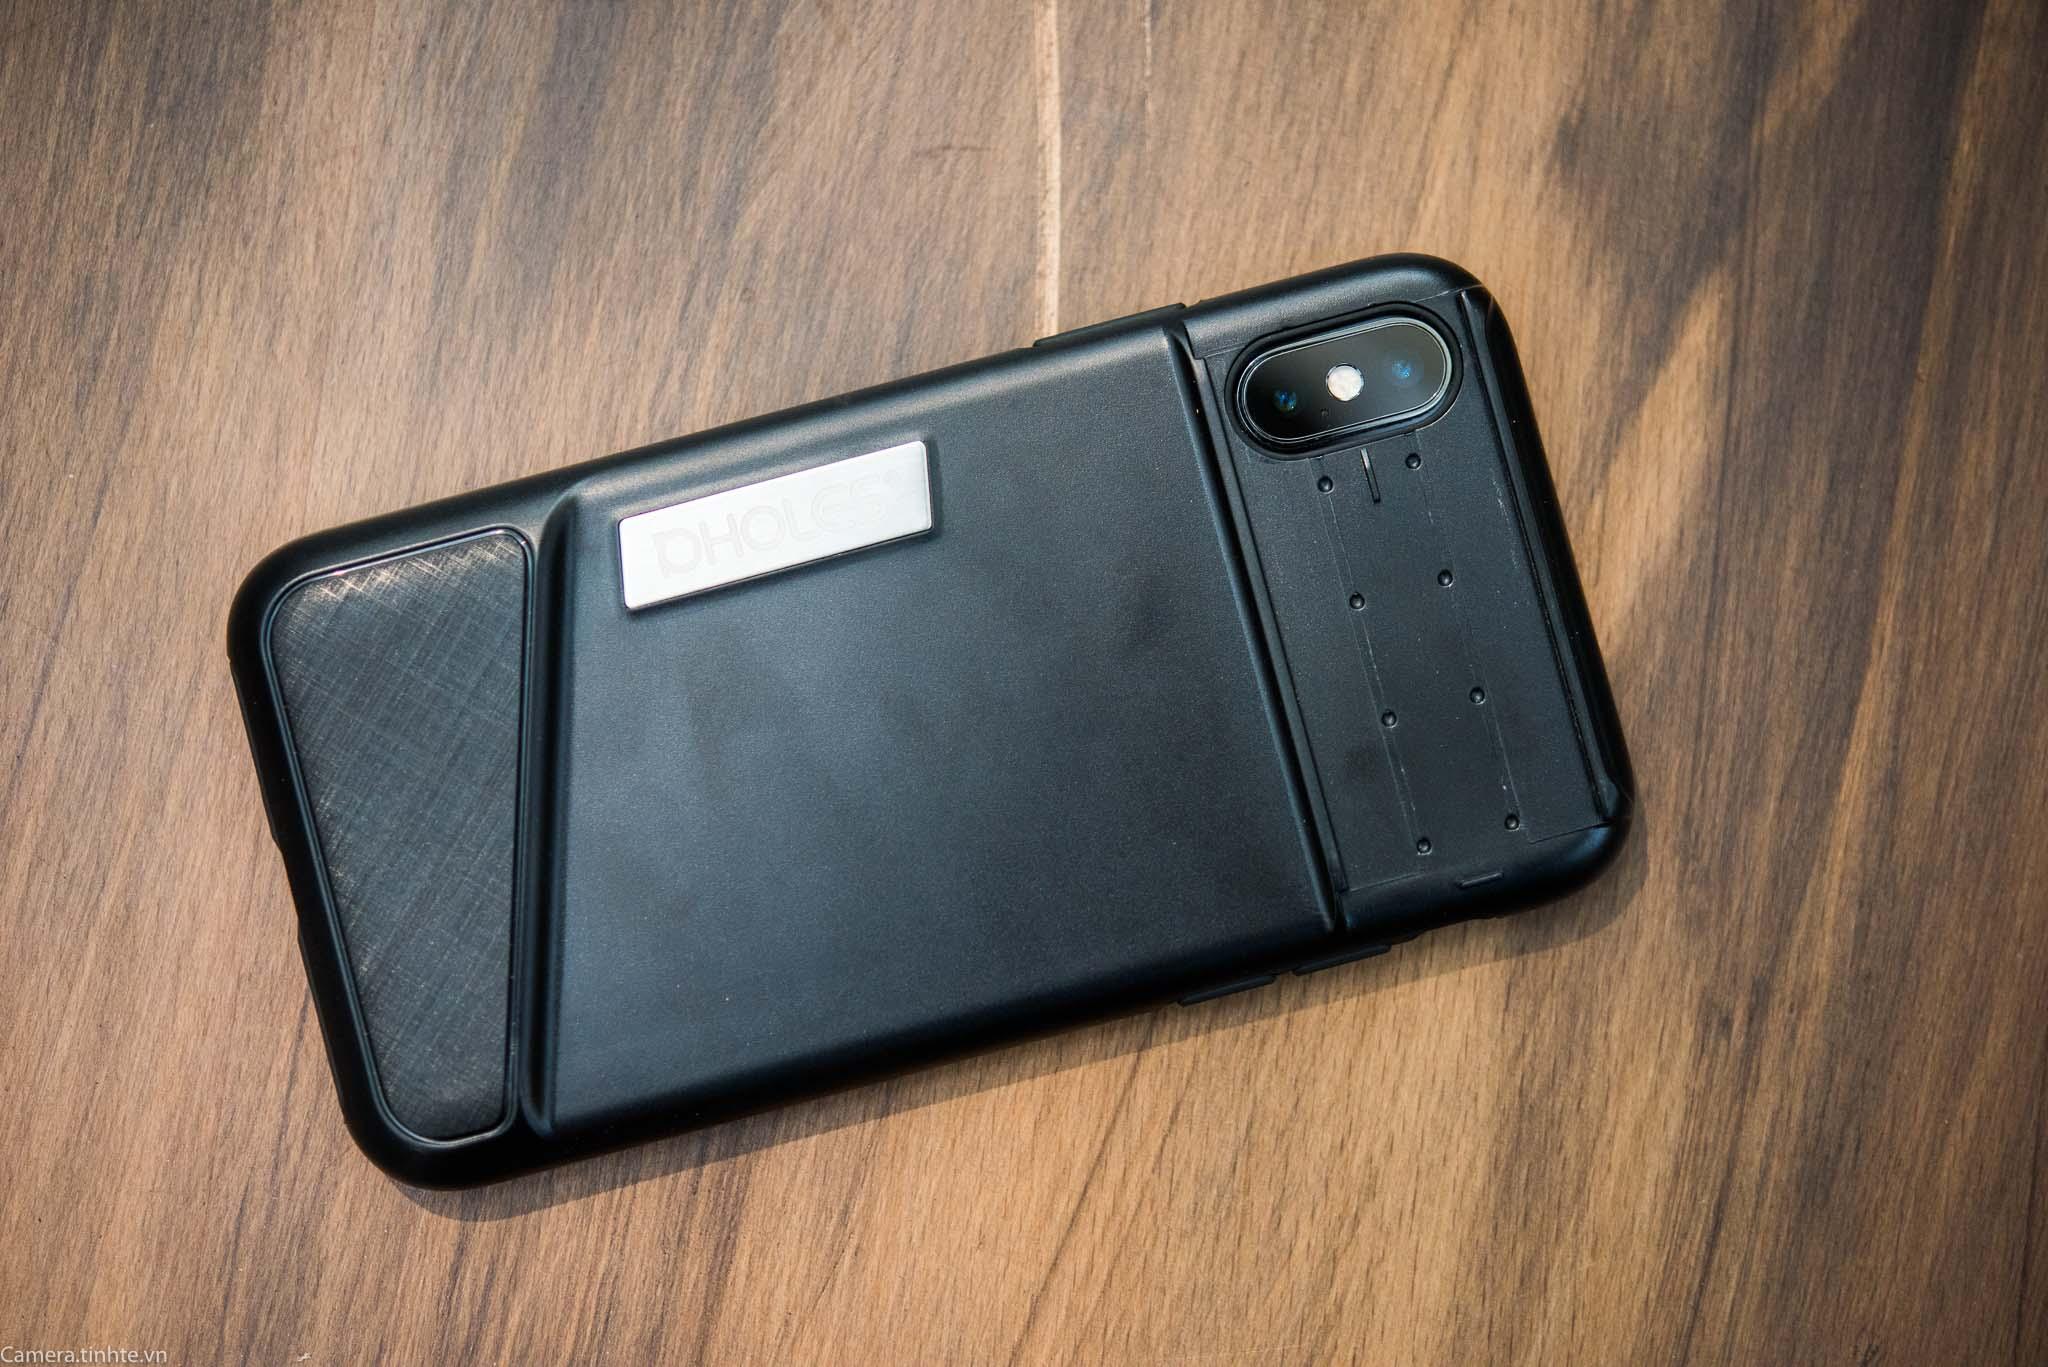 Tren tay ong kinh P-Hole lens iPhone X - Camera.tinhte.vn-4.jpg